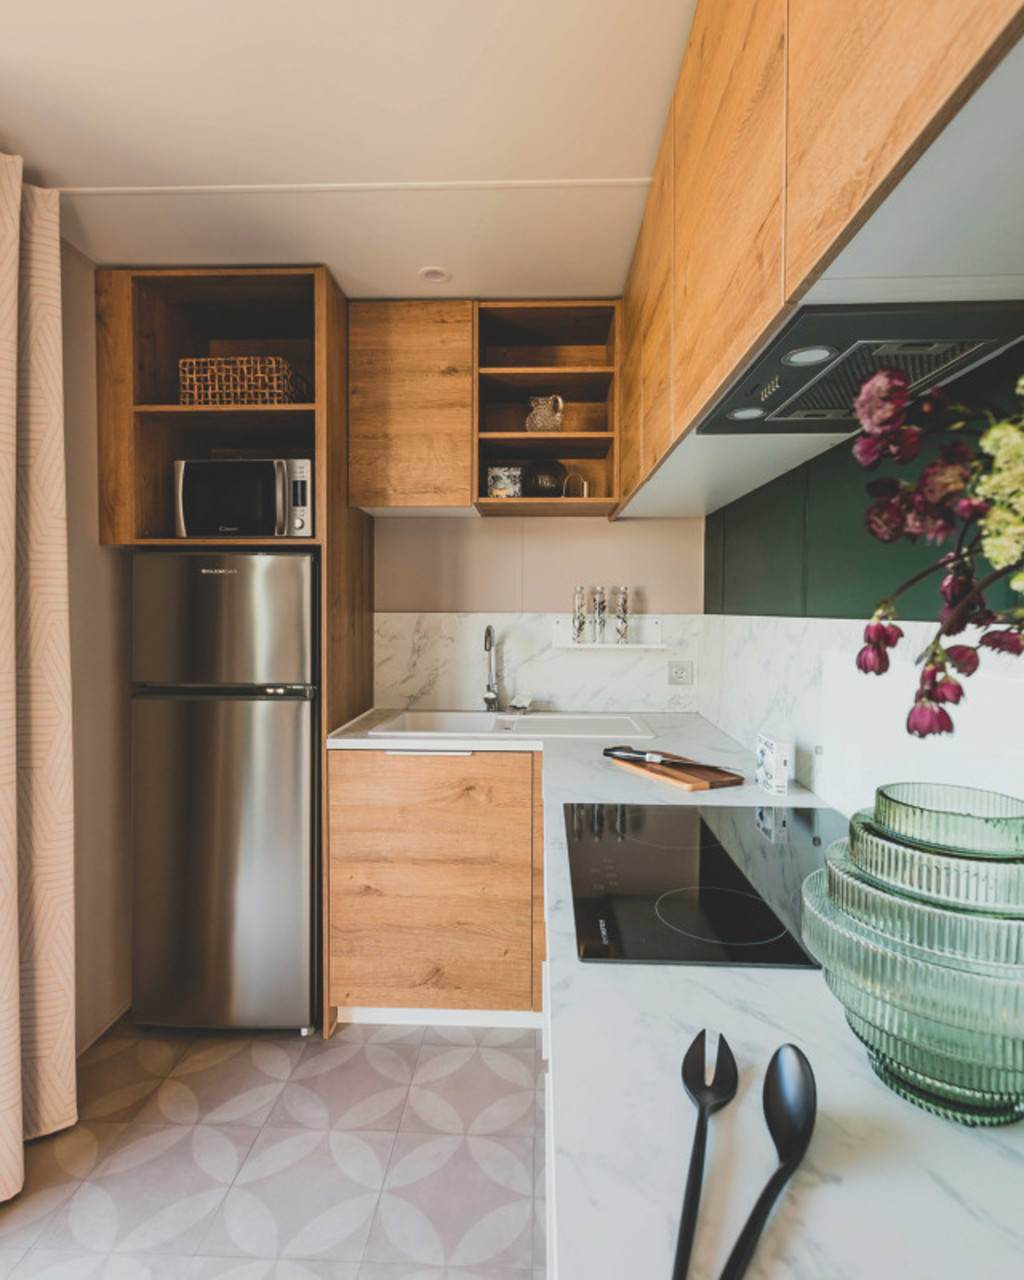 O'HARA 844 - 2022 - Mobil home Neuf - 2 Chambres -Zen Mobil homes